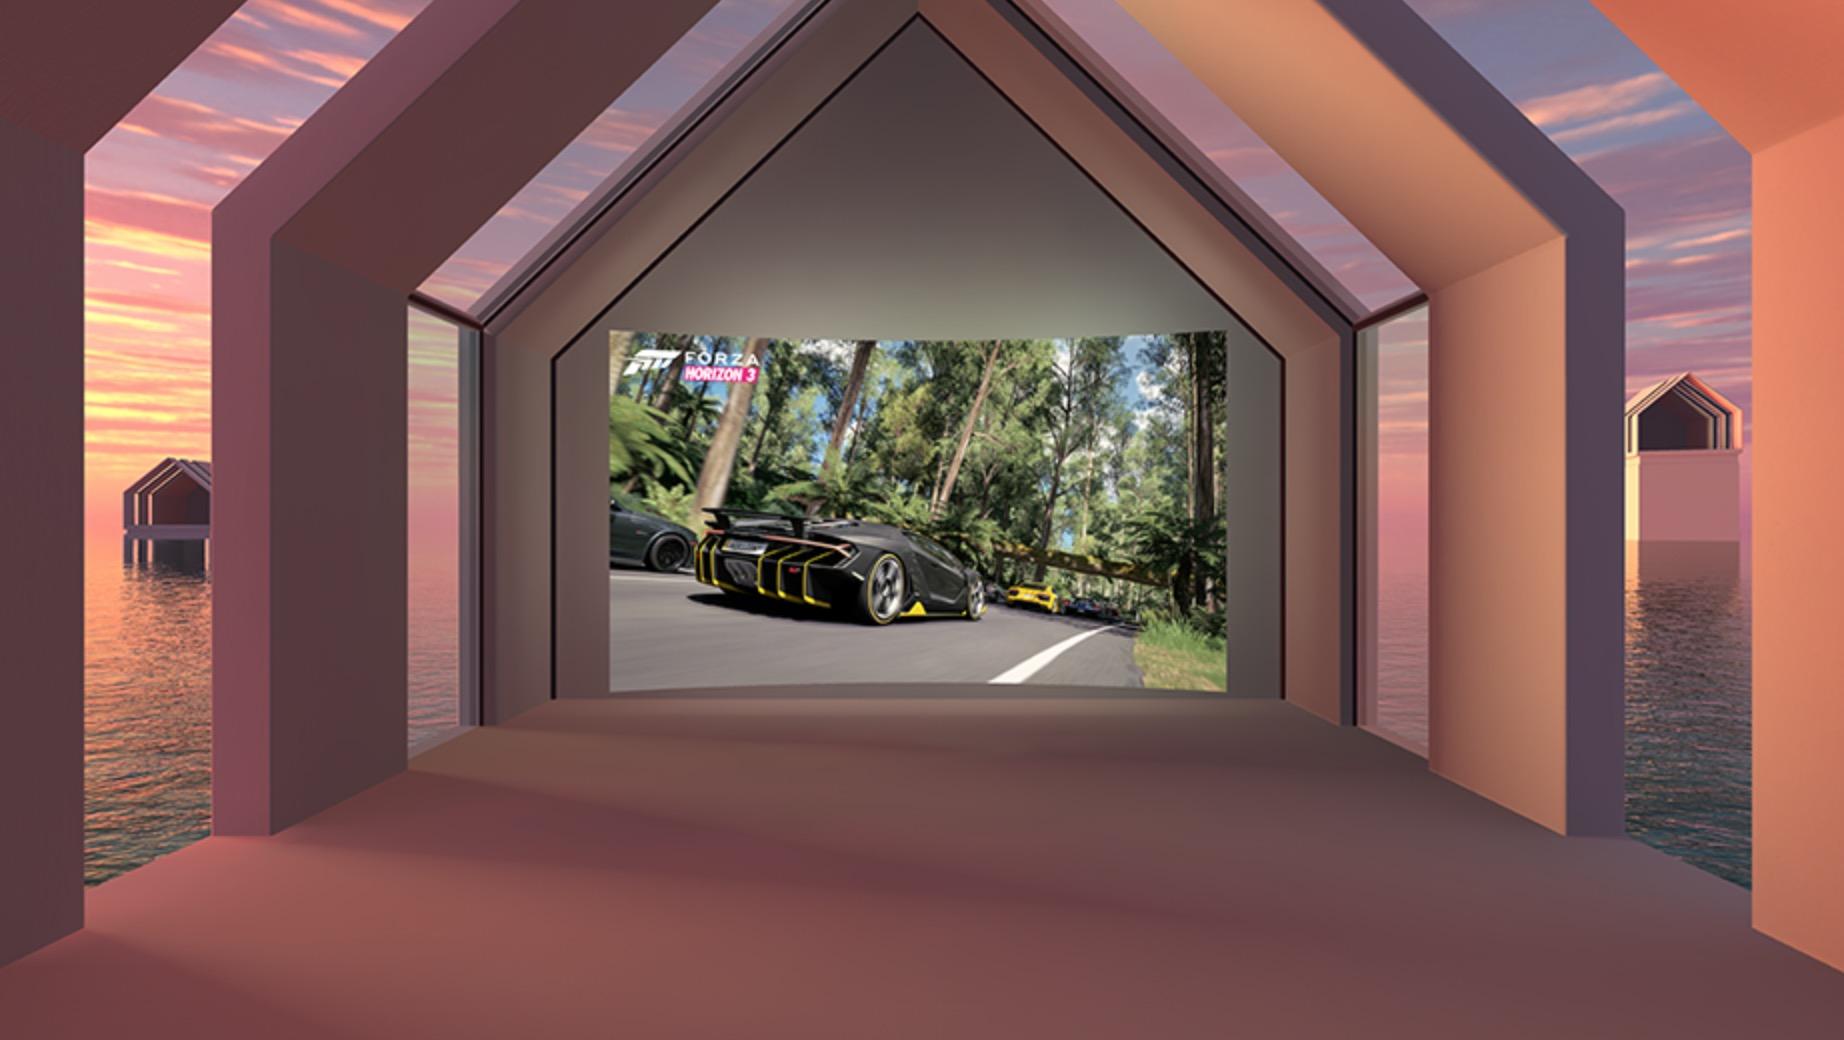 Realtà virtuale Oculus Rift e Xbox One